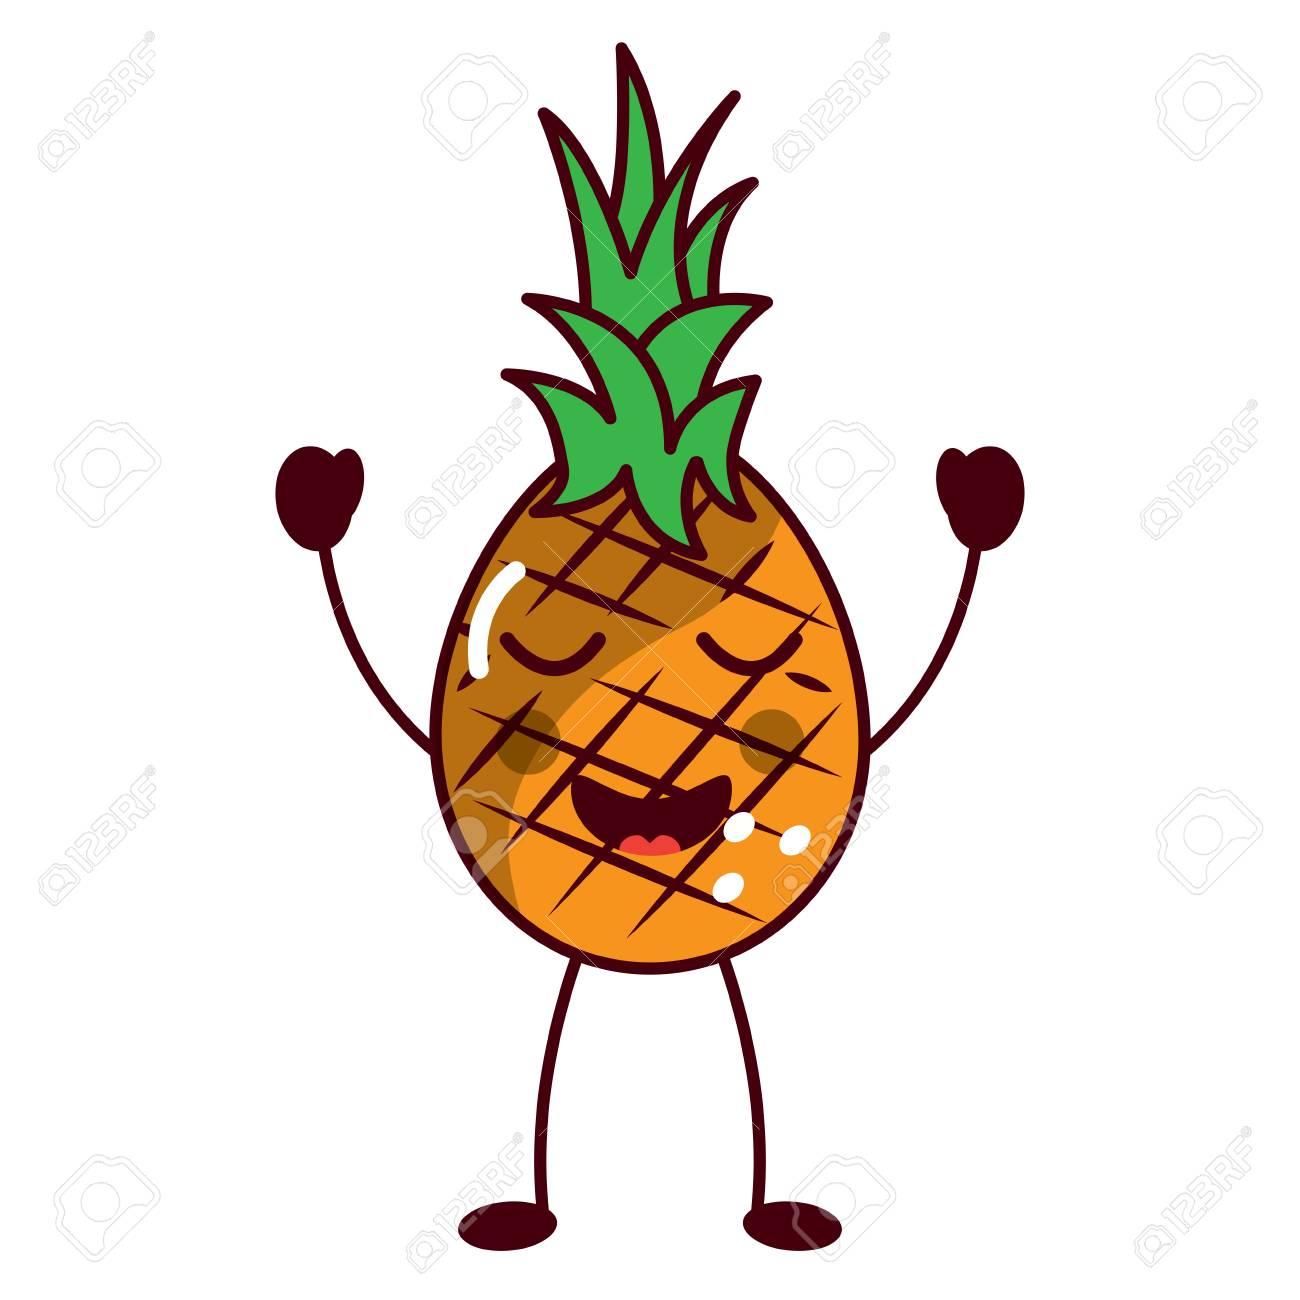 Pinapple Happy Bliss Fruit Kawaii Icon Image Vector Illustration